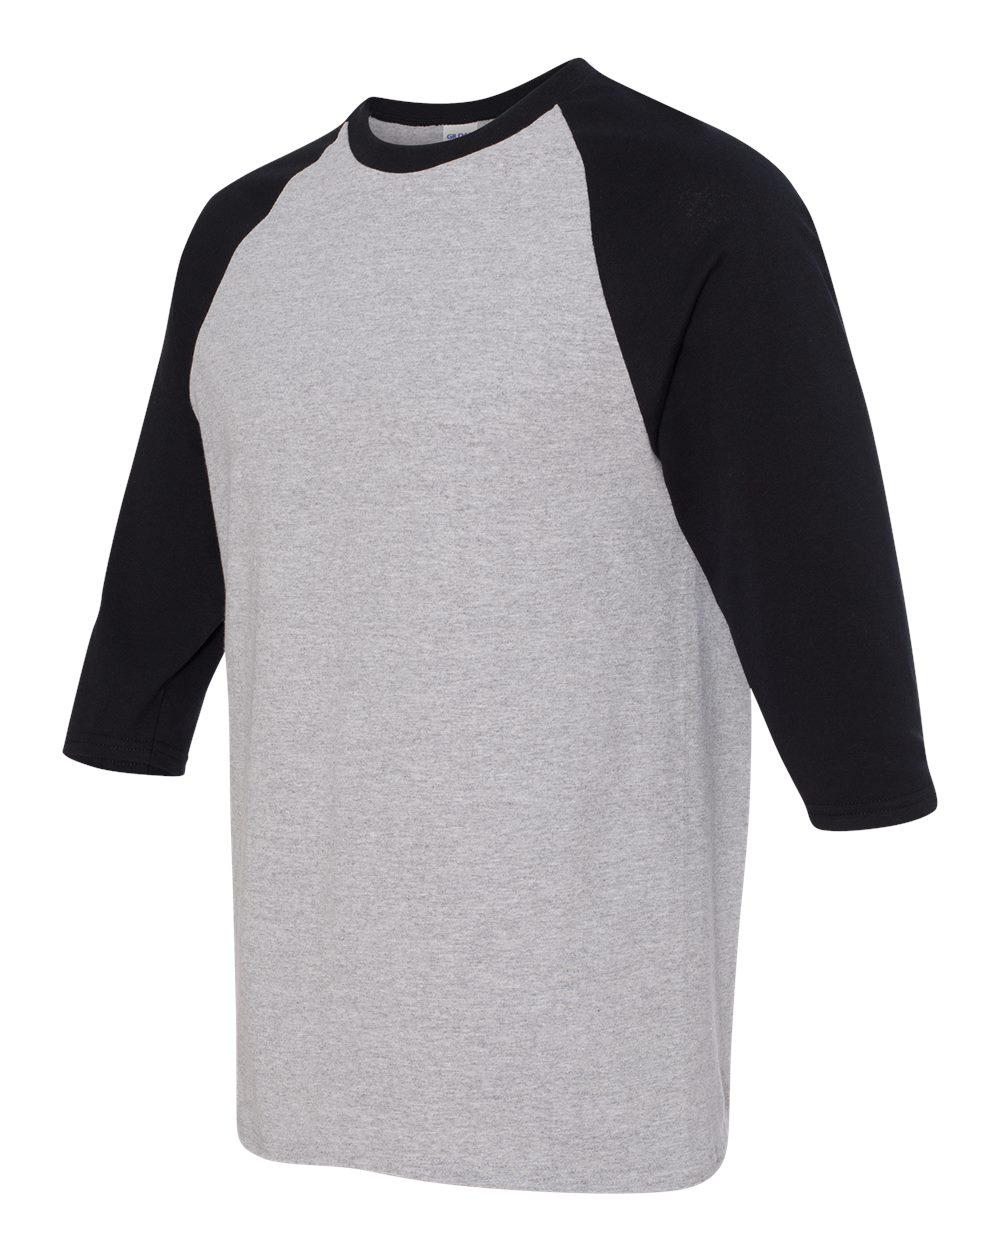 Mens Polyester V Neck T Shirts